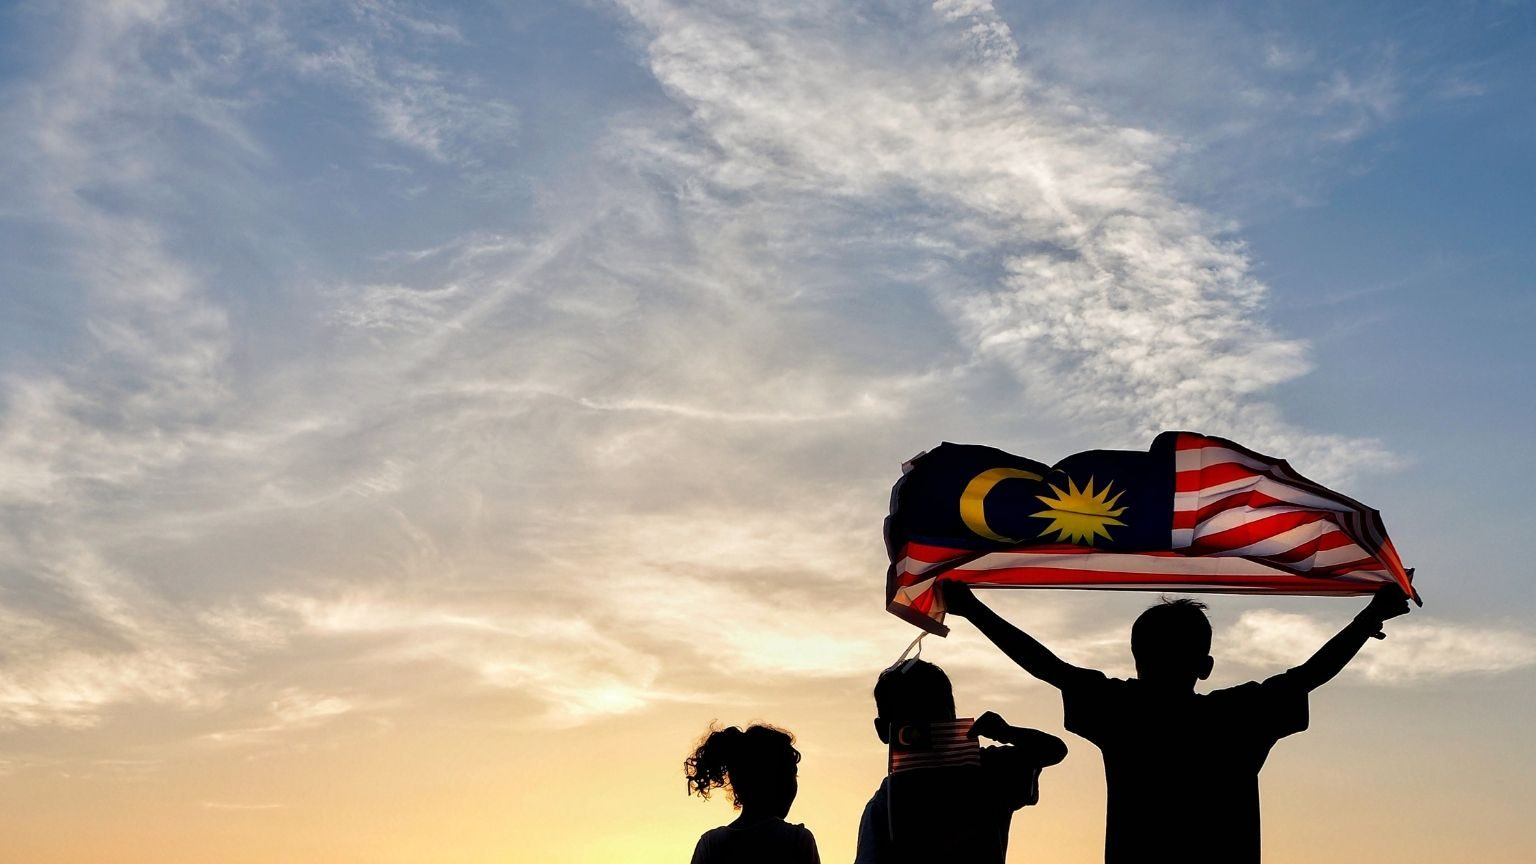 Children waving Malaysian flag